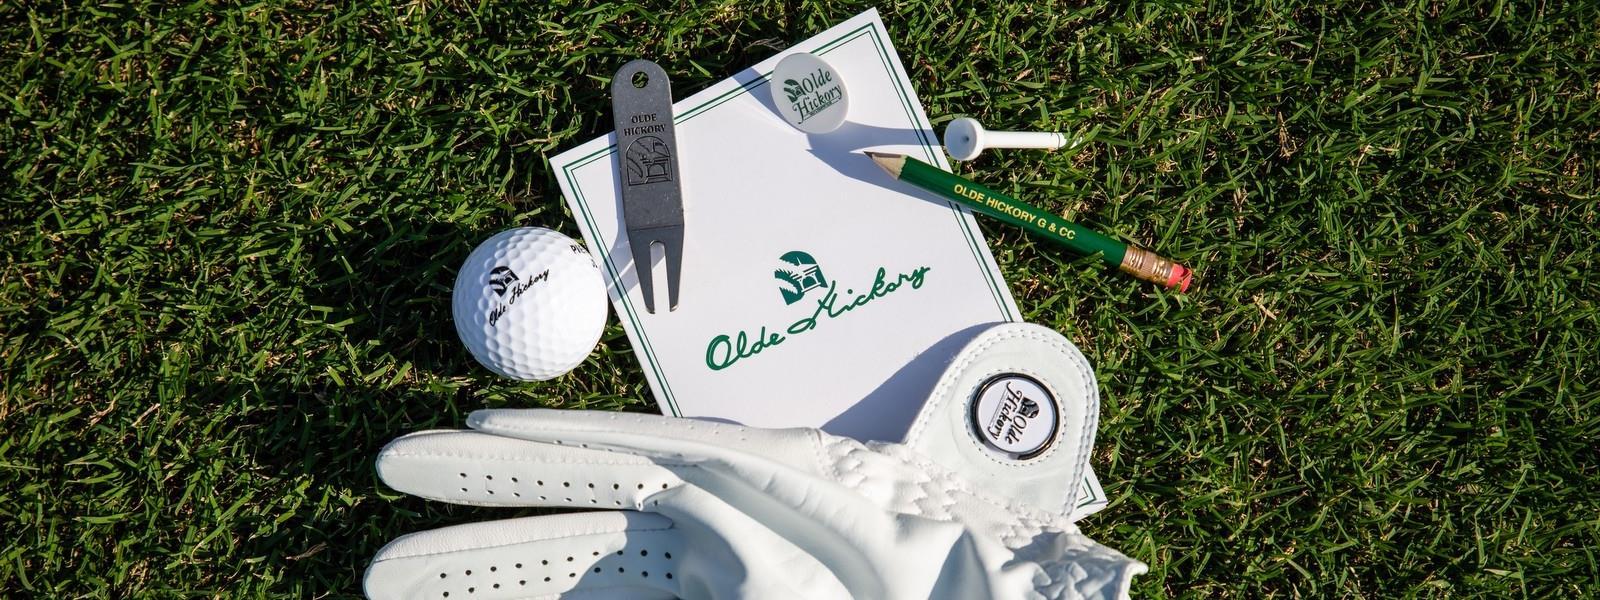 Scorecard Olde Hickory Golf Country Club